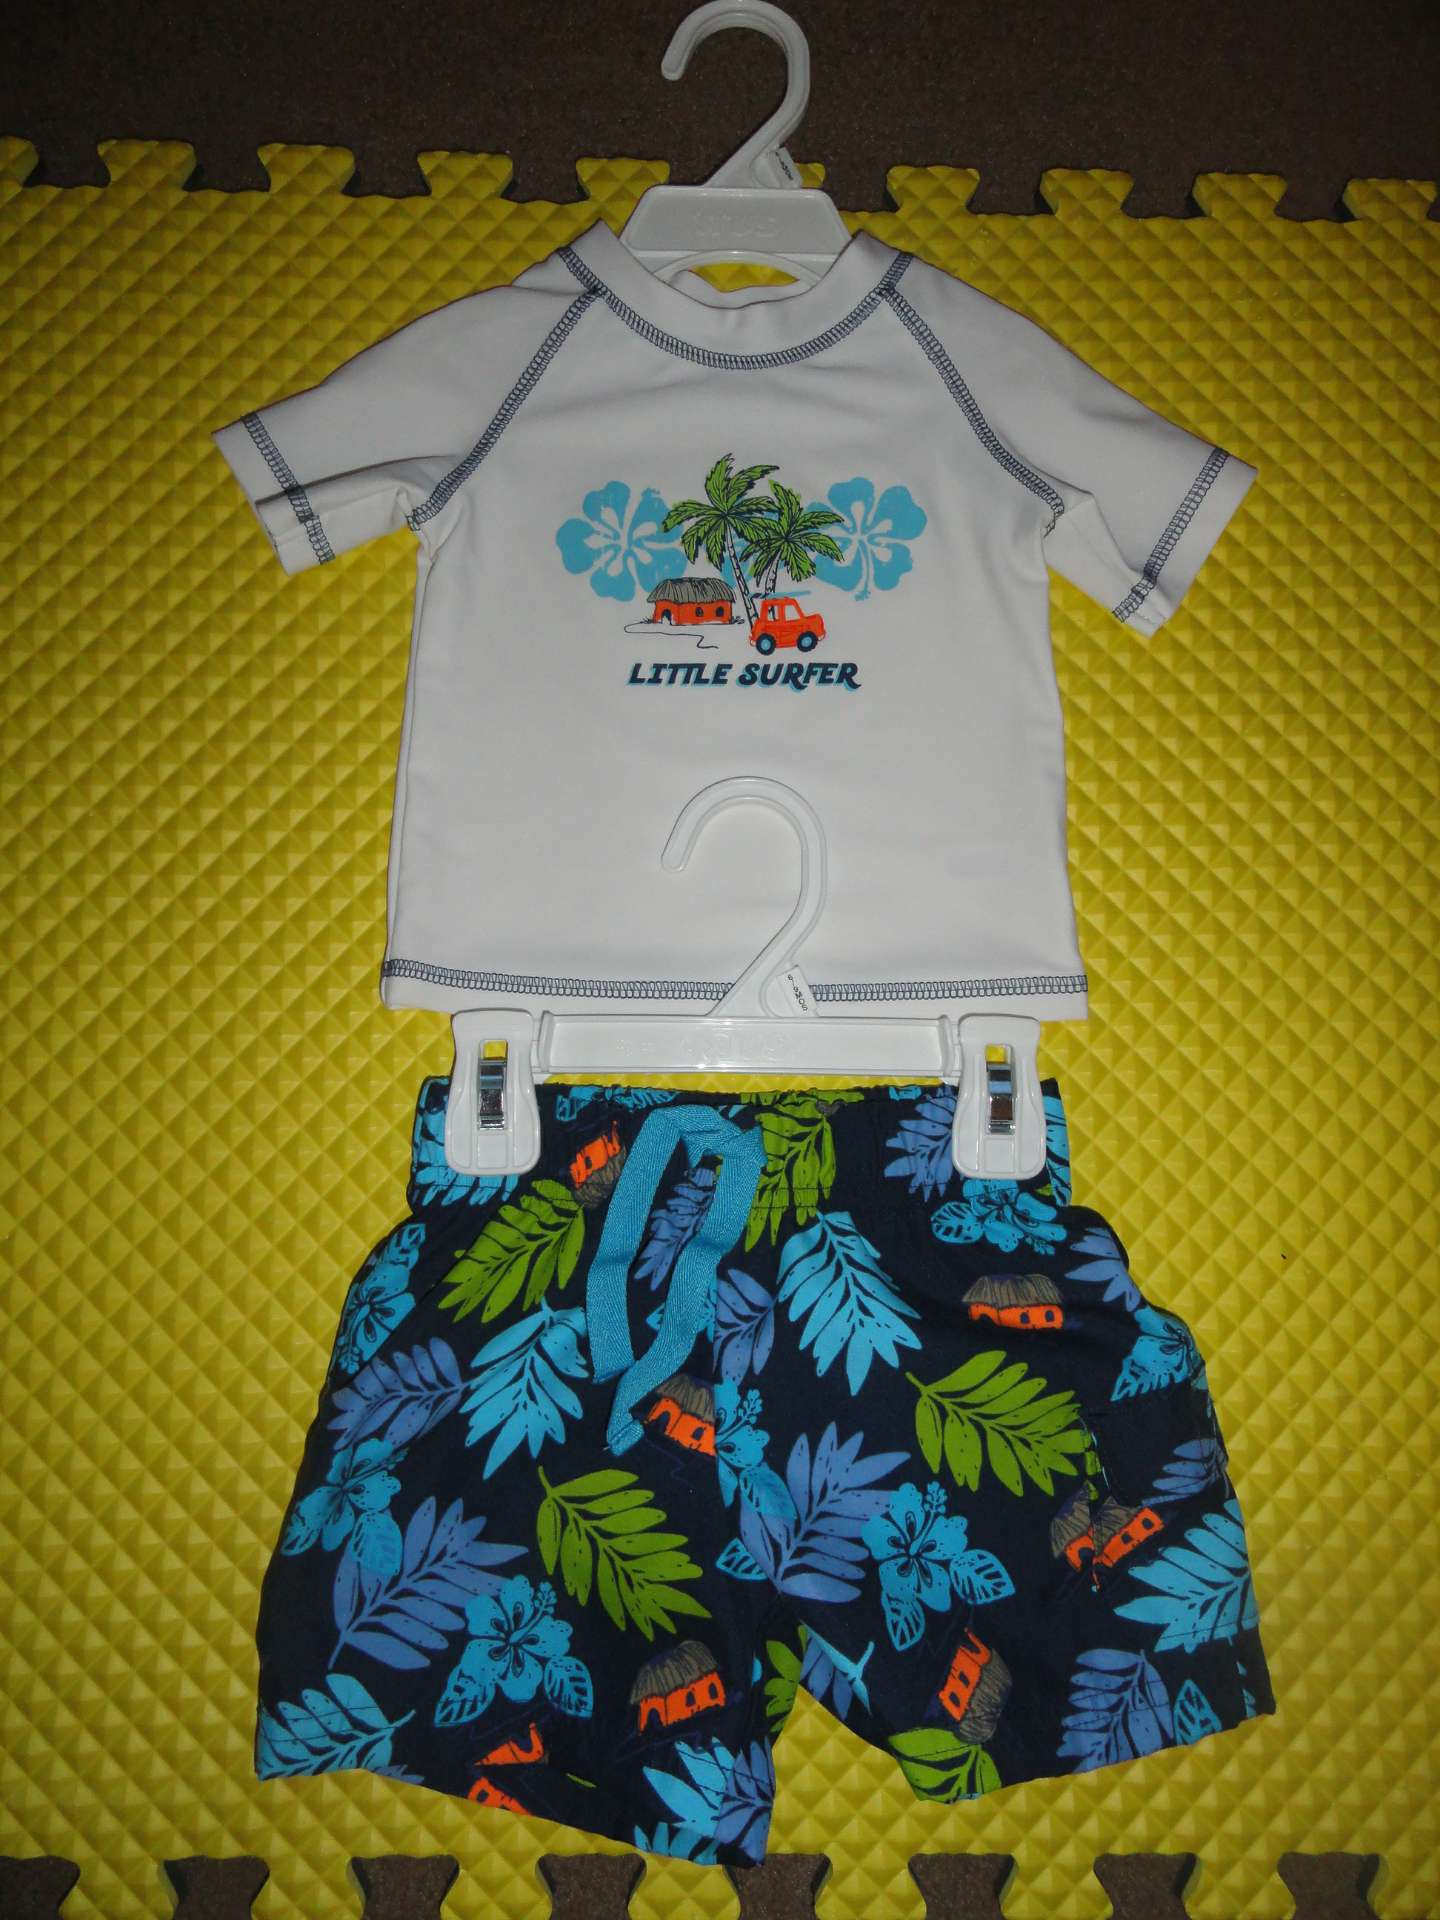 Photo Koala Baby Little Surfer Short Sleeve Rash Guard Shirt and Koala Baby Swim Trunks with a Liner Set - 6-9 Months